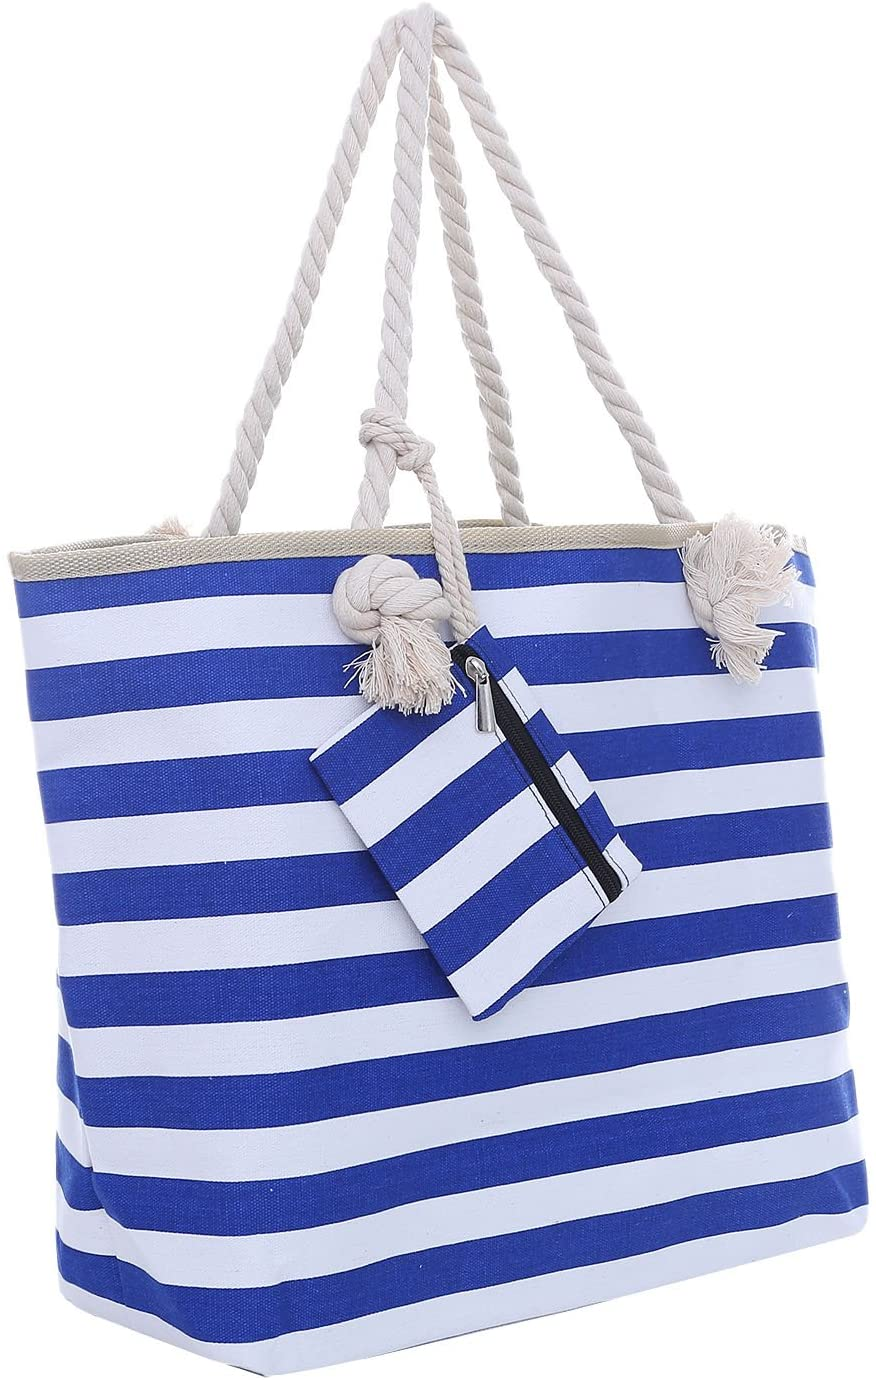 Large beach bag with zip closure